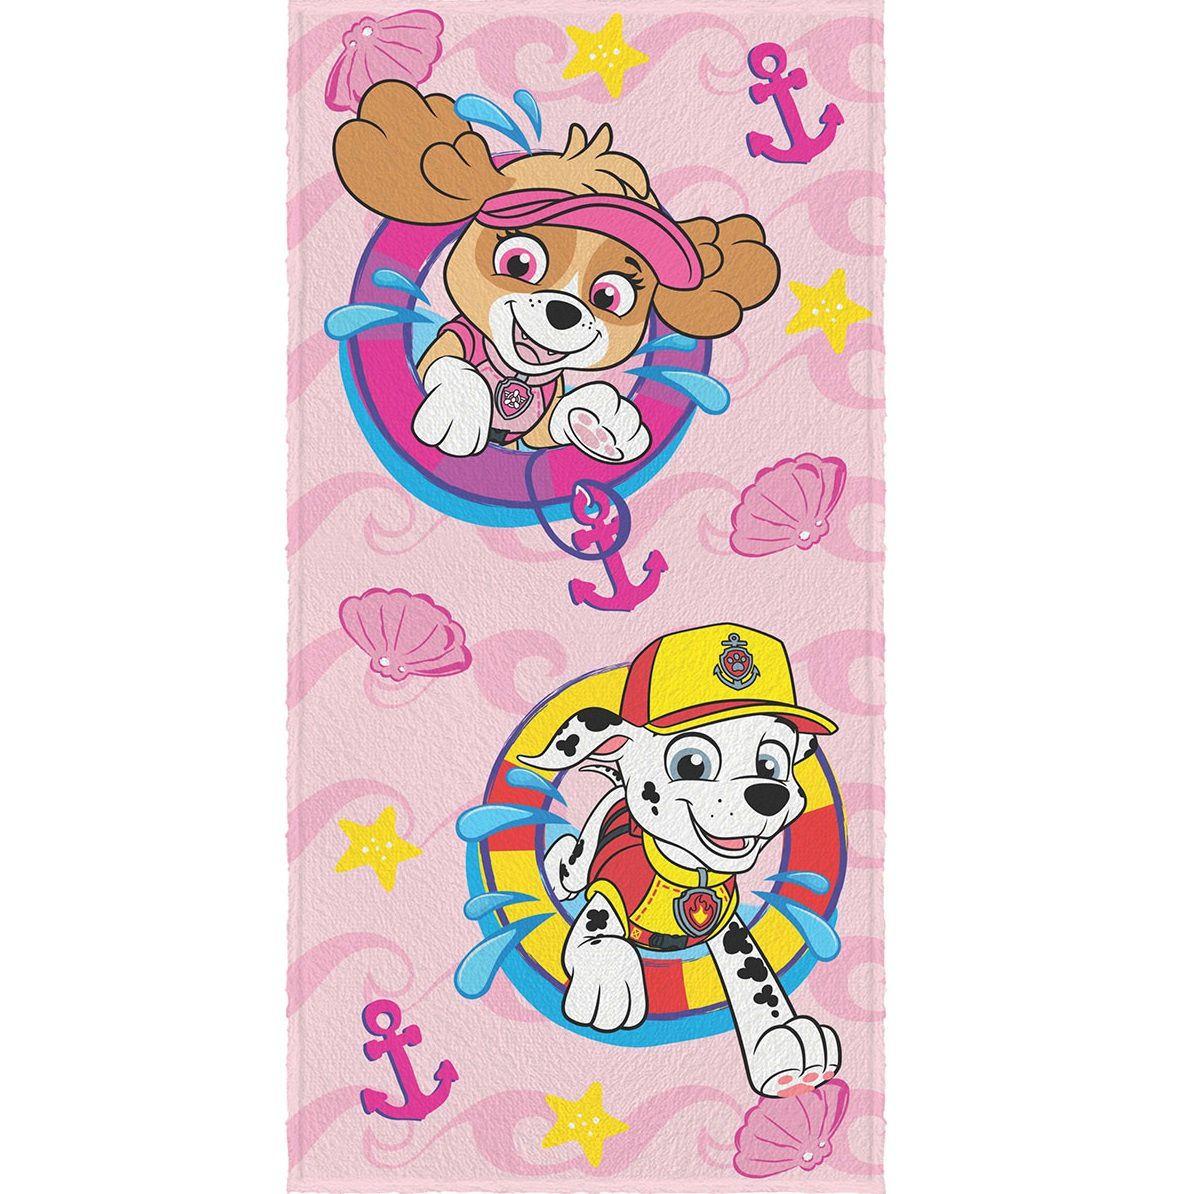 Toalha De Banho Infantil Felpuda Patrulha Canina Lepper #1